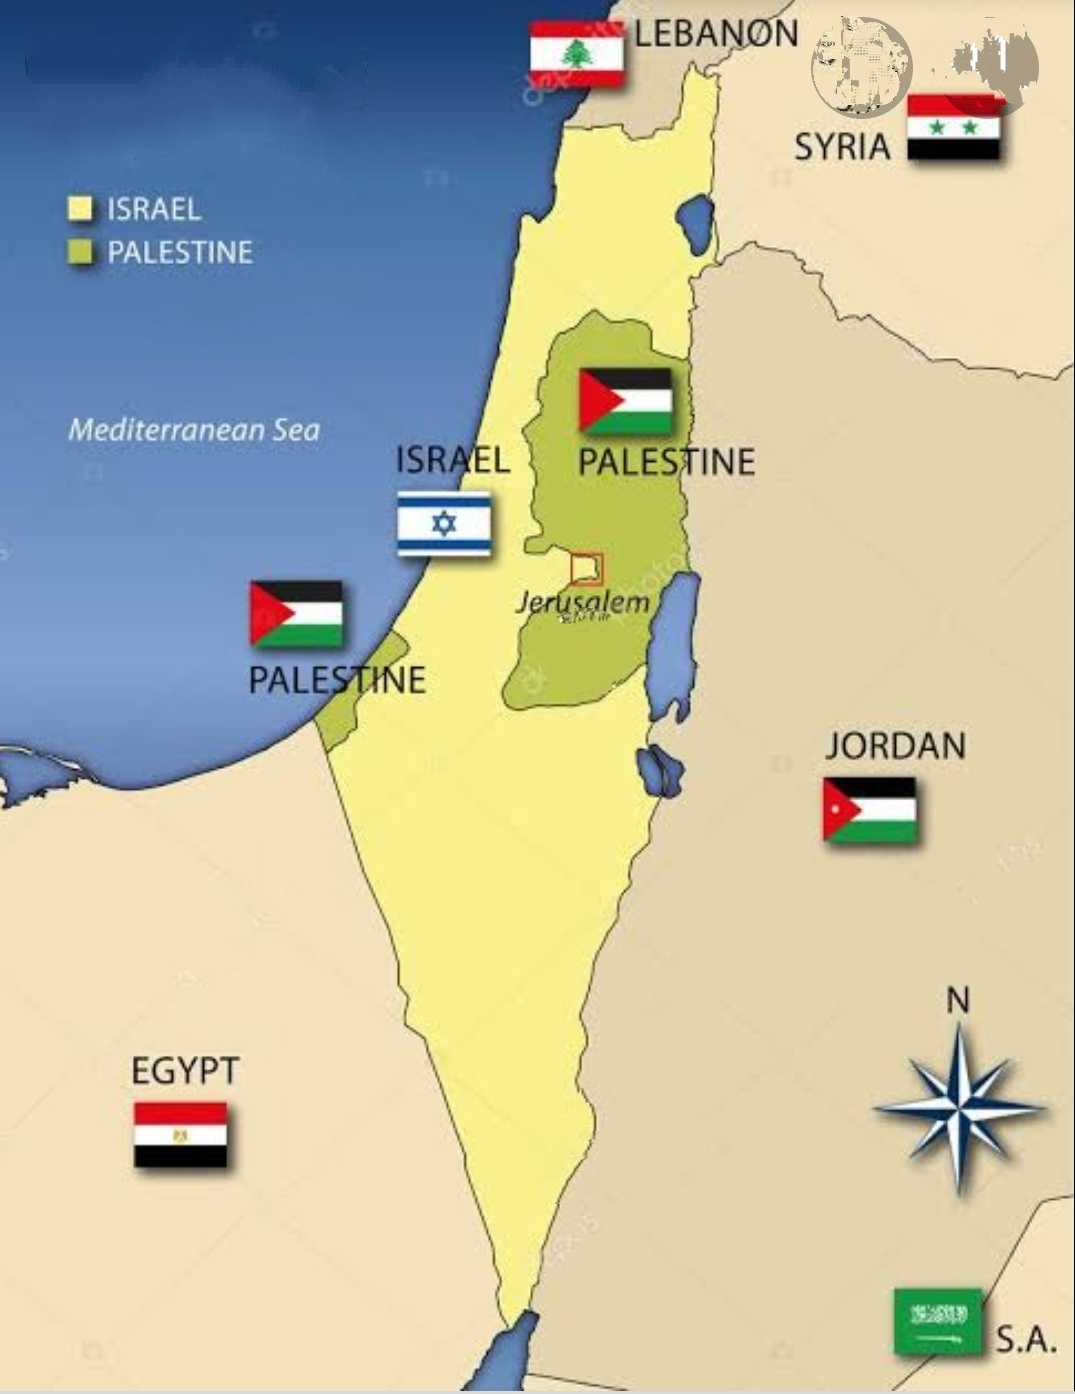 इजराइल और फिलिस्तीन का संघर्ष, भाग 1 (conflict between Israel and  Palestine, part 1)